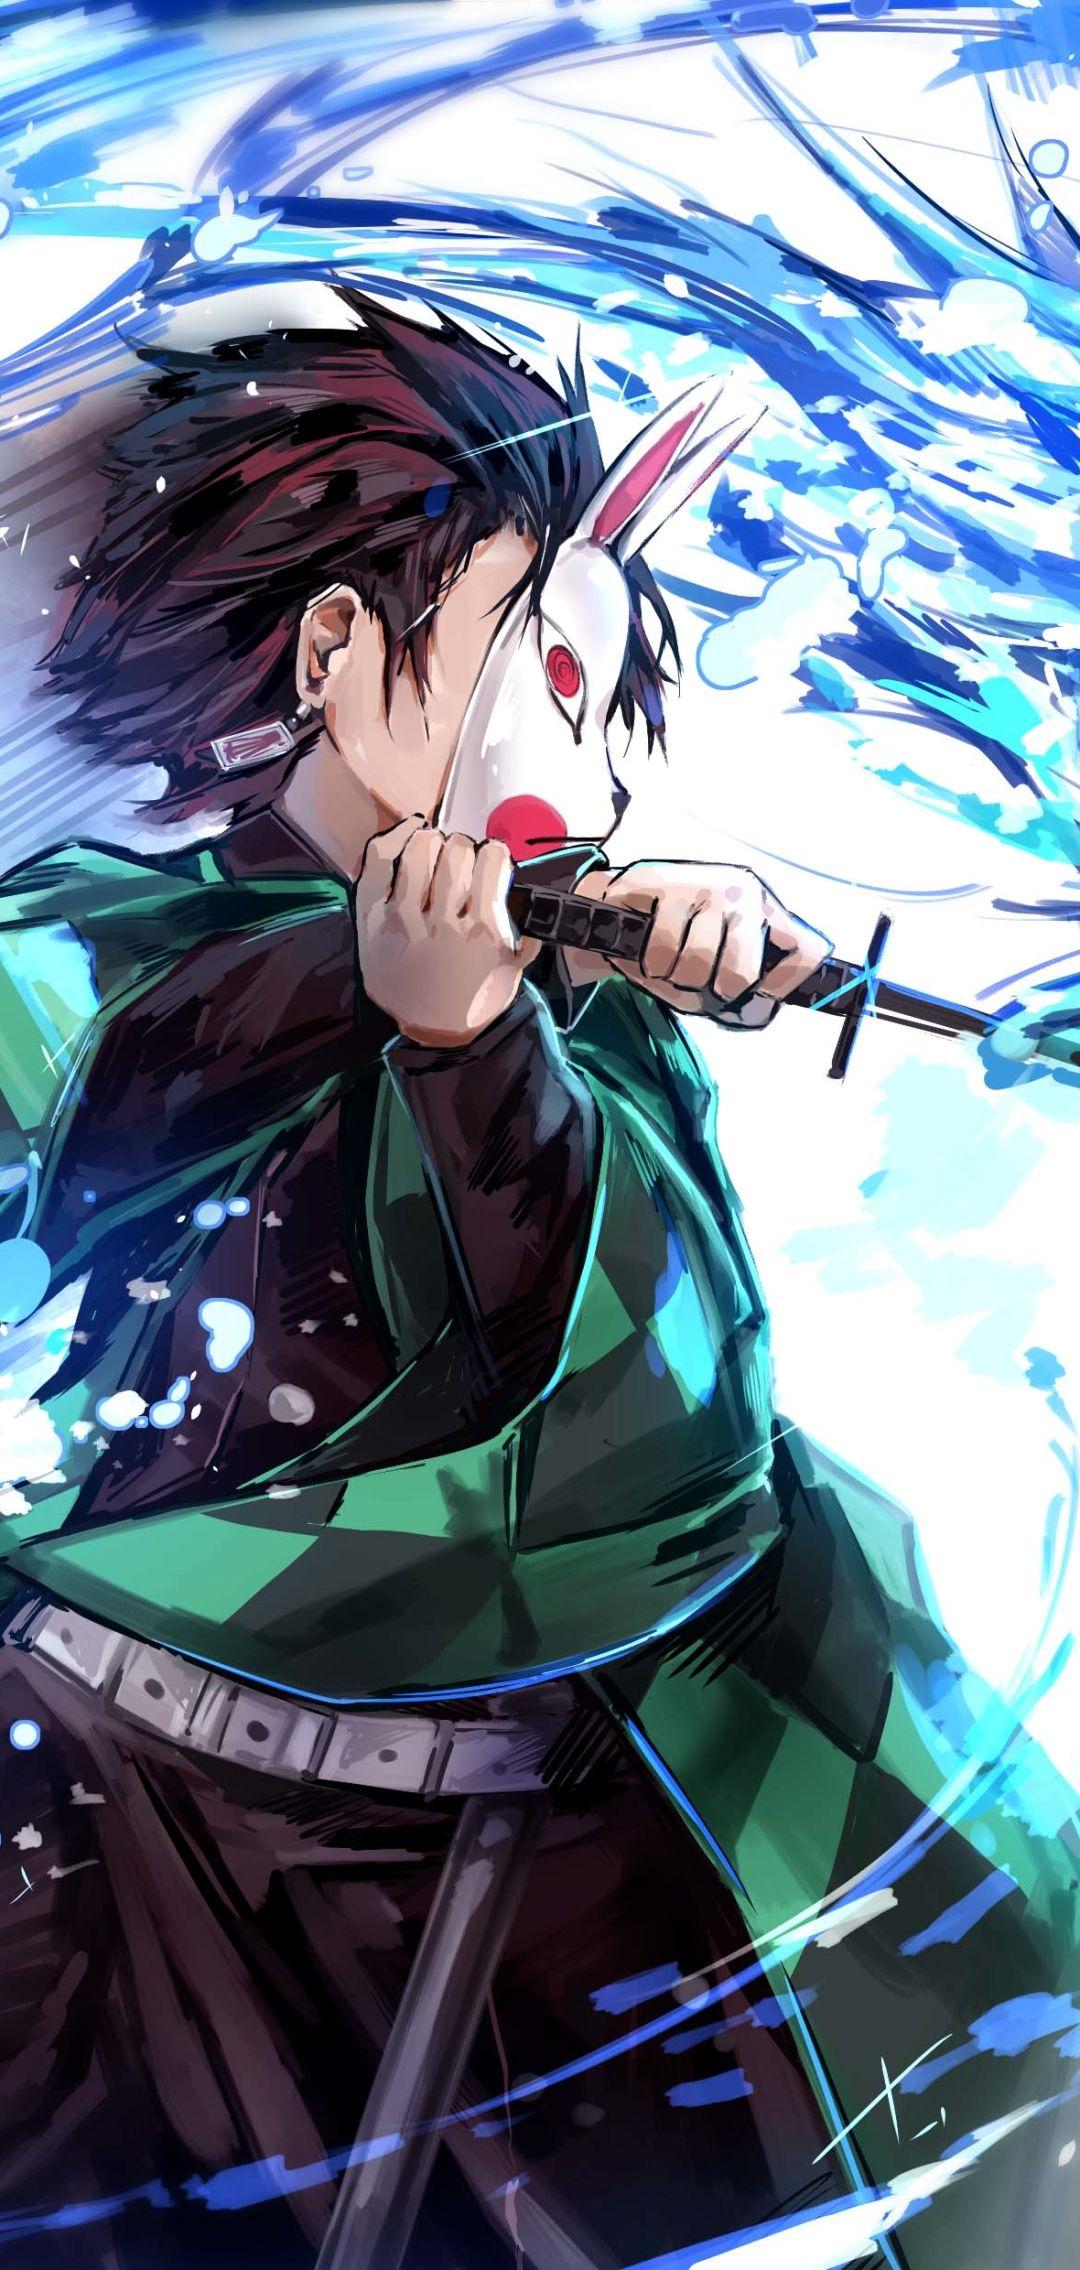 Tanjirou Demon Slayer Aka Kimetsu No Yaiba Ilustrasi Karakter Gambar Karakter Hantu